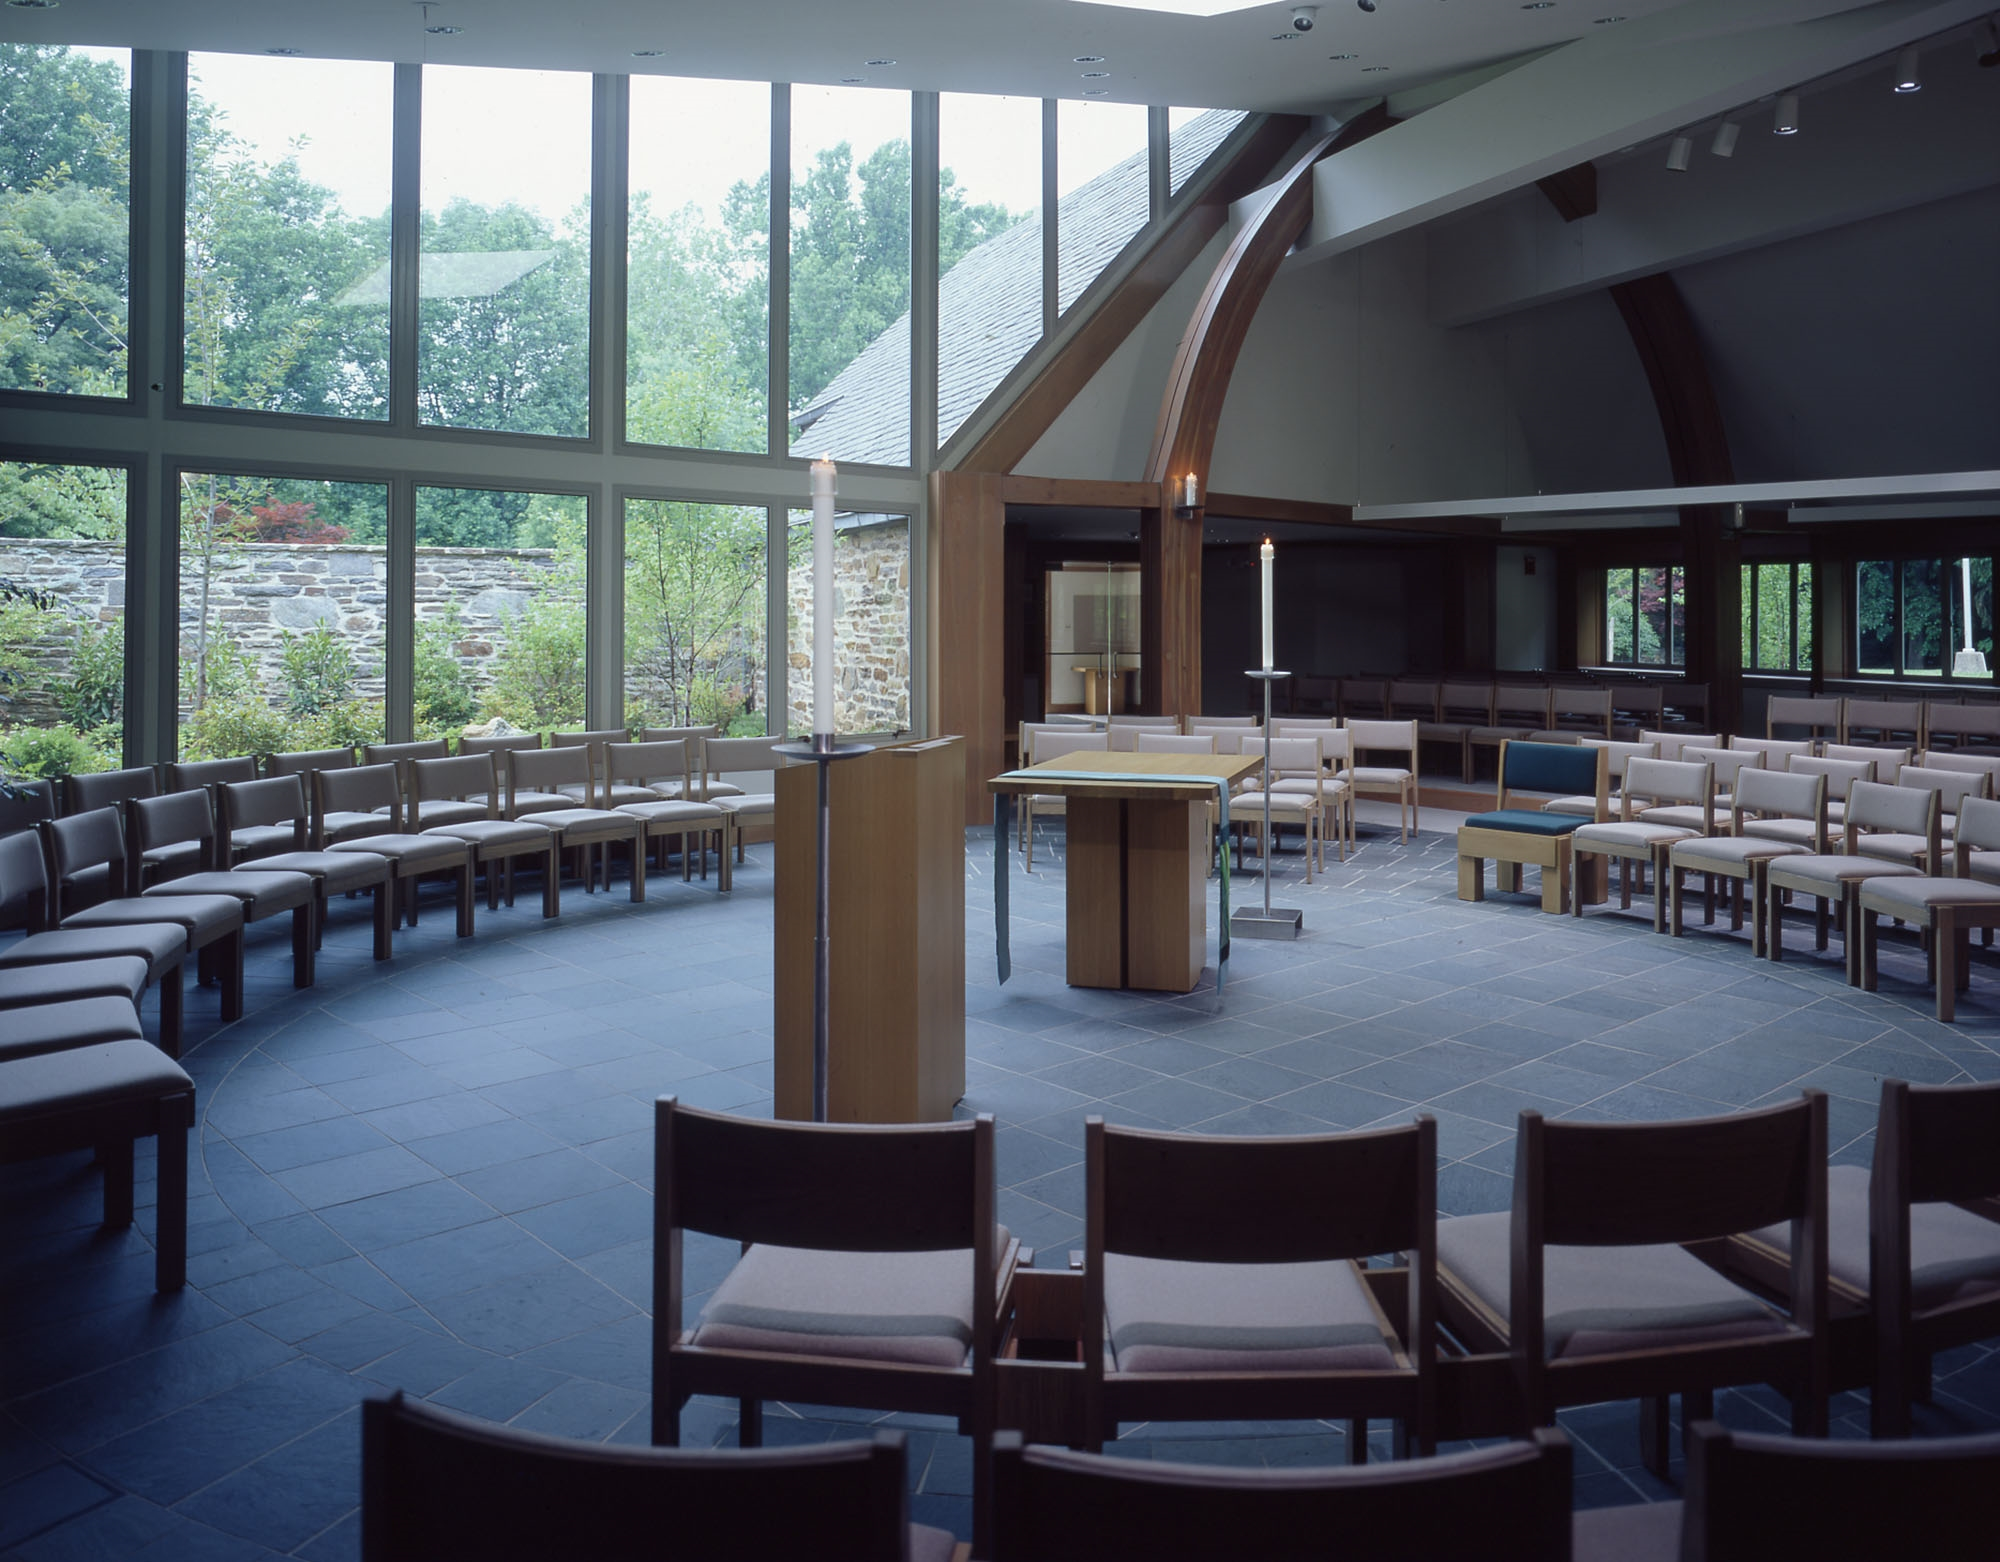 Carmelite Monastery - interior.jpg